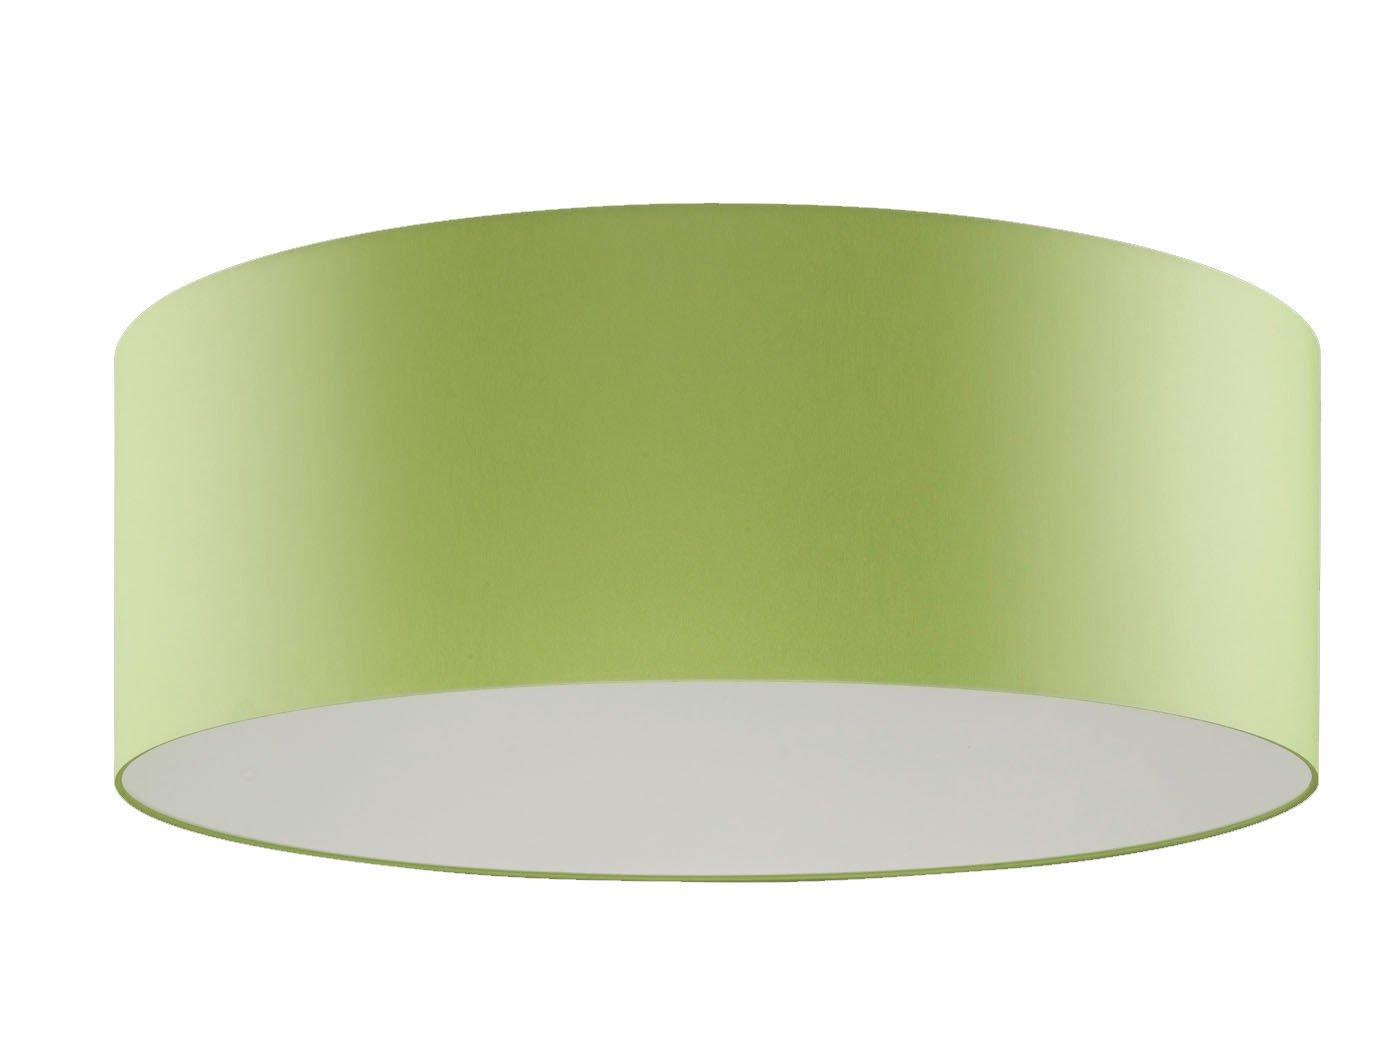 Plafoniera Tessuto Grande : Grandi led plafoniera shine loft Ø 100 cm tessuto paralume verde